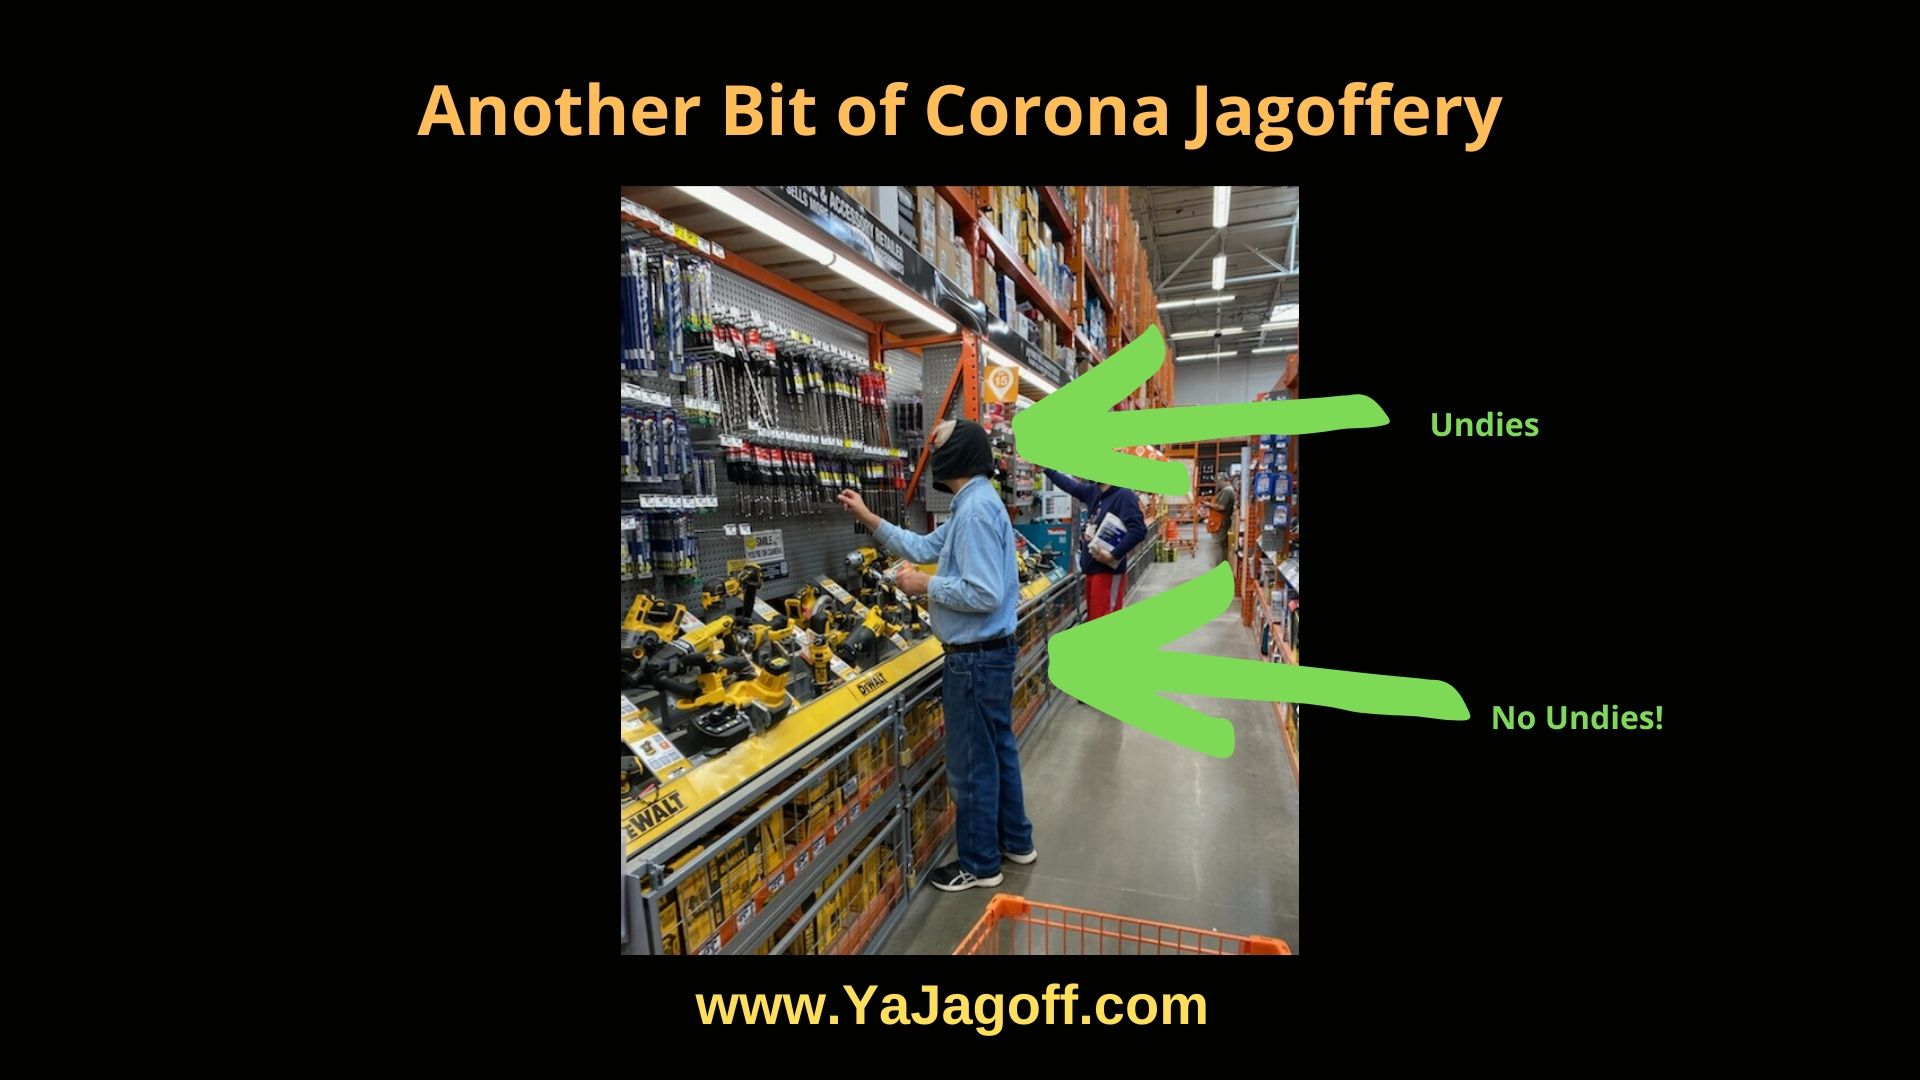 Coronavirus jagoffs YaJagoff Podcast